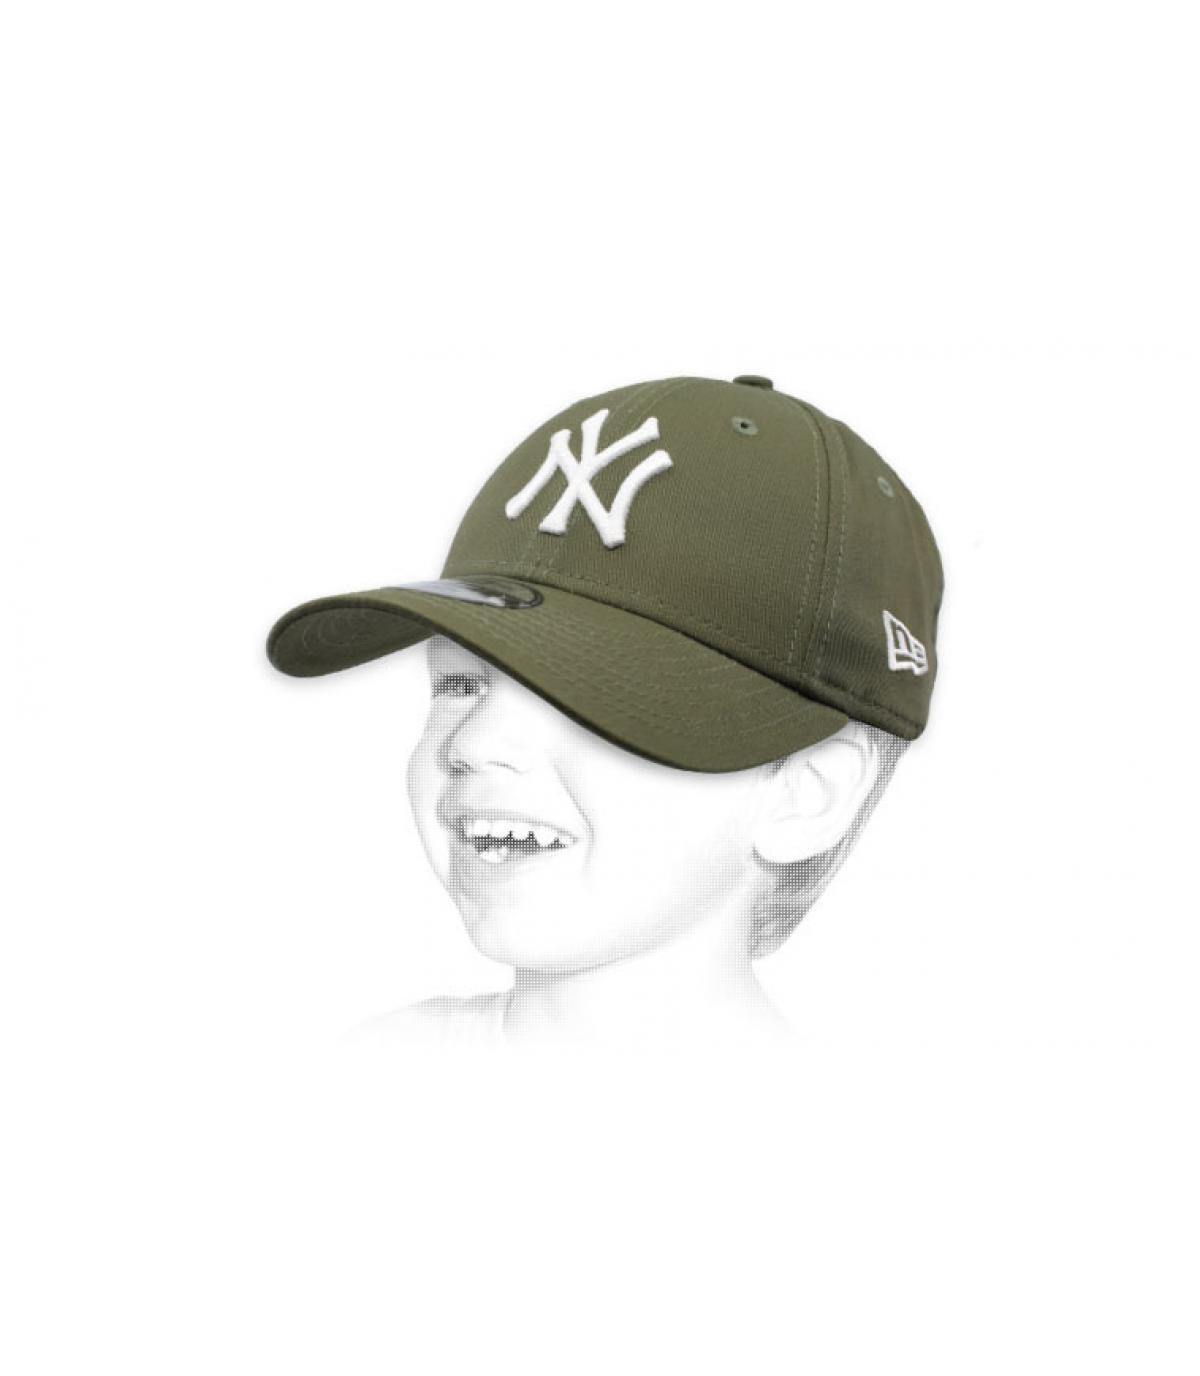 gorra niño NY verde